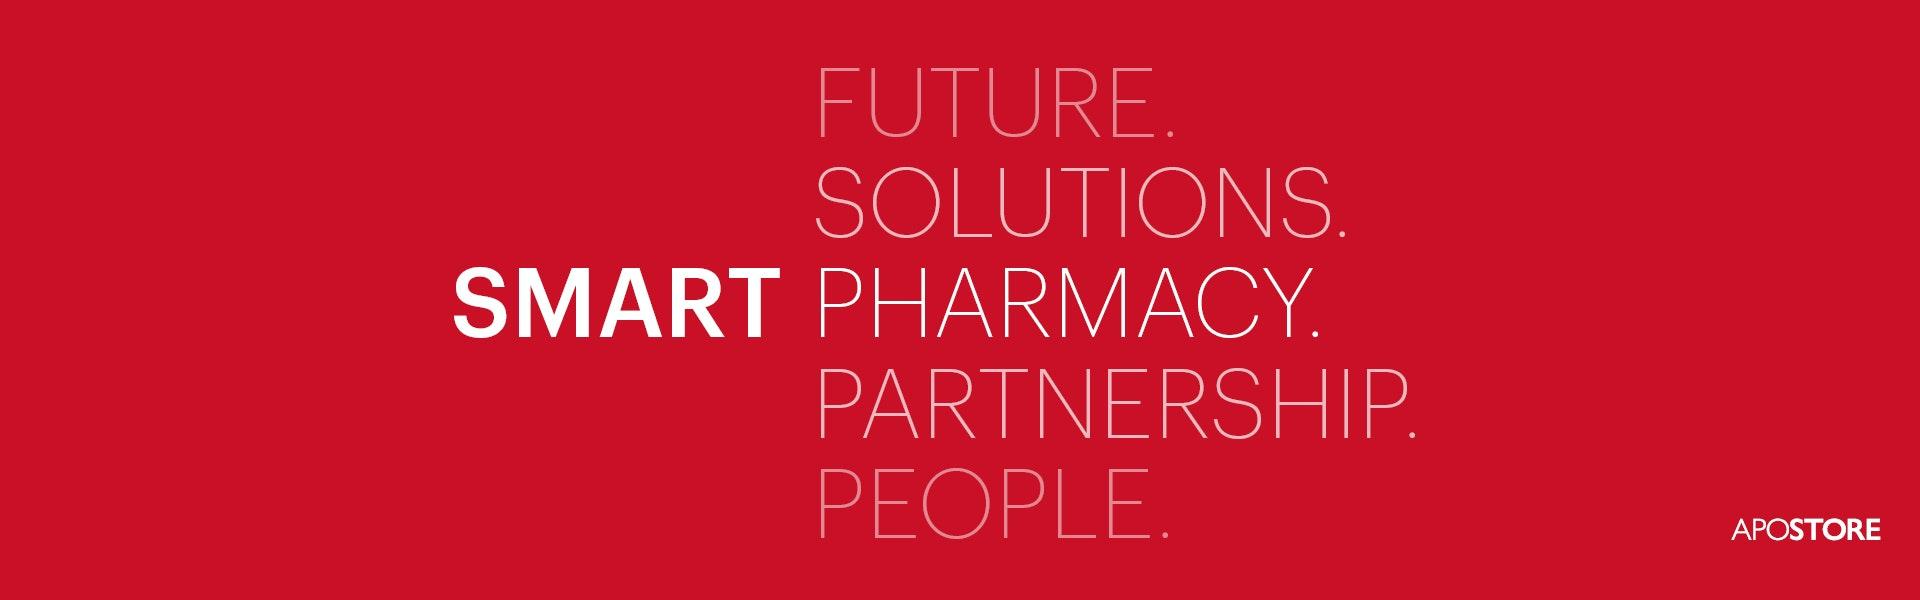 V1 202108 Apostore Kommissionierautomaten Digitale Apotheke expopharm Impuls 2021 Smart Pharmacy Core wide